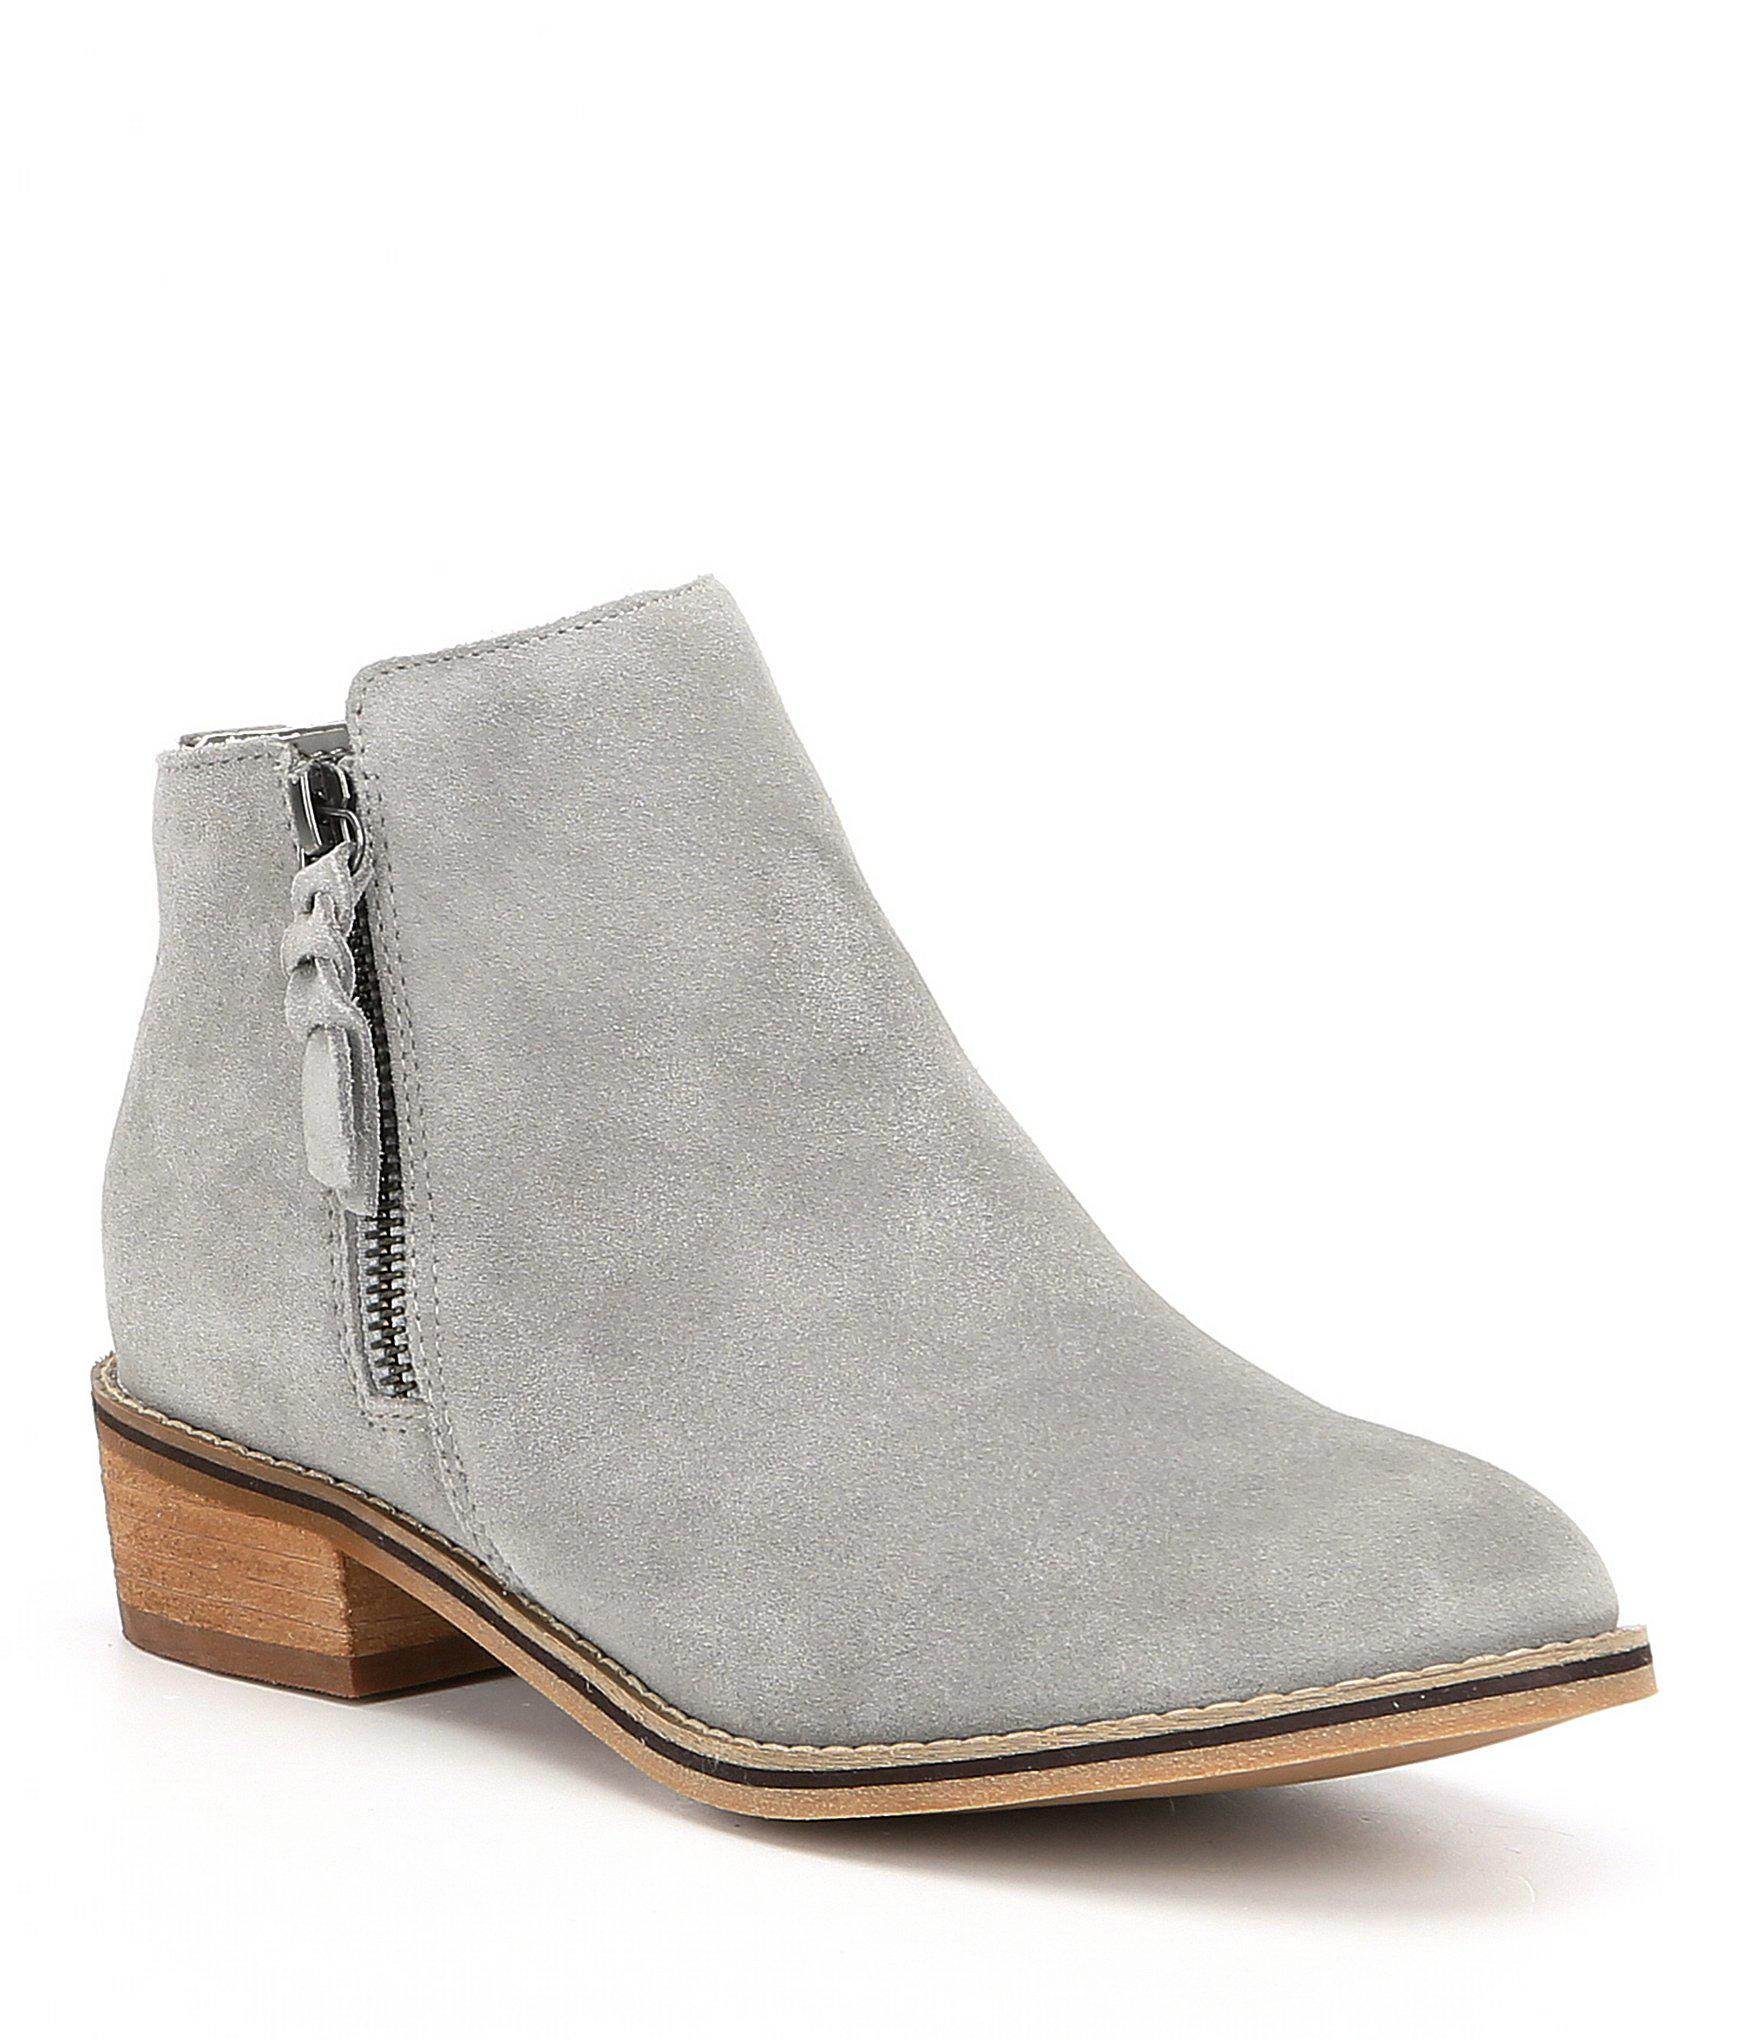 602a81a6c Blondo Waterproof Liam Suede Block Heel Booties in Gray - Lyst